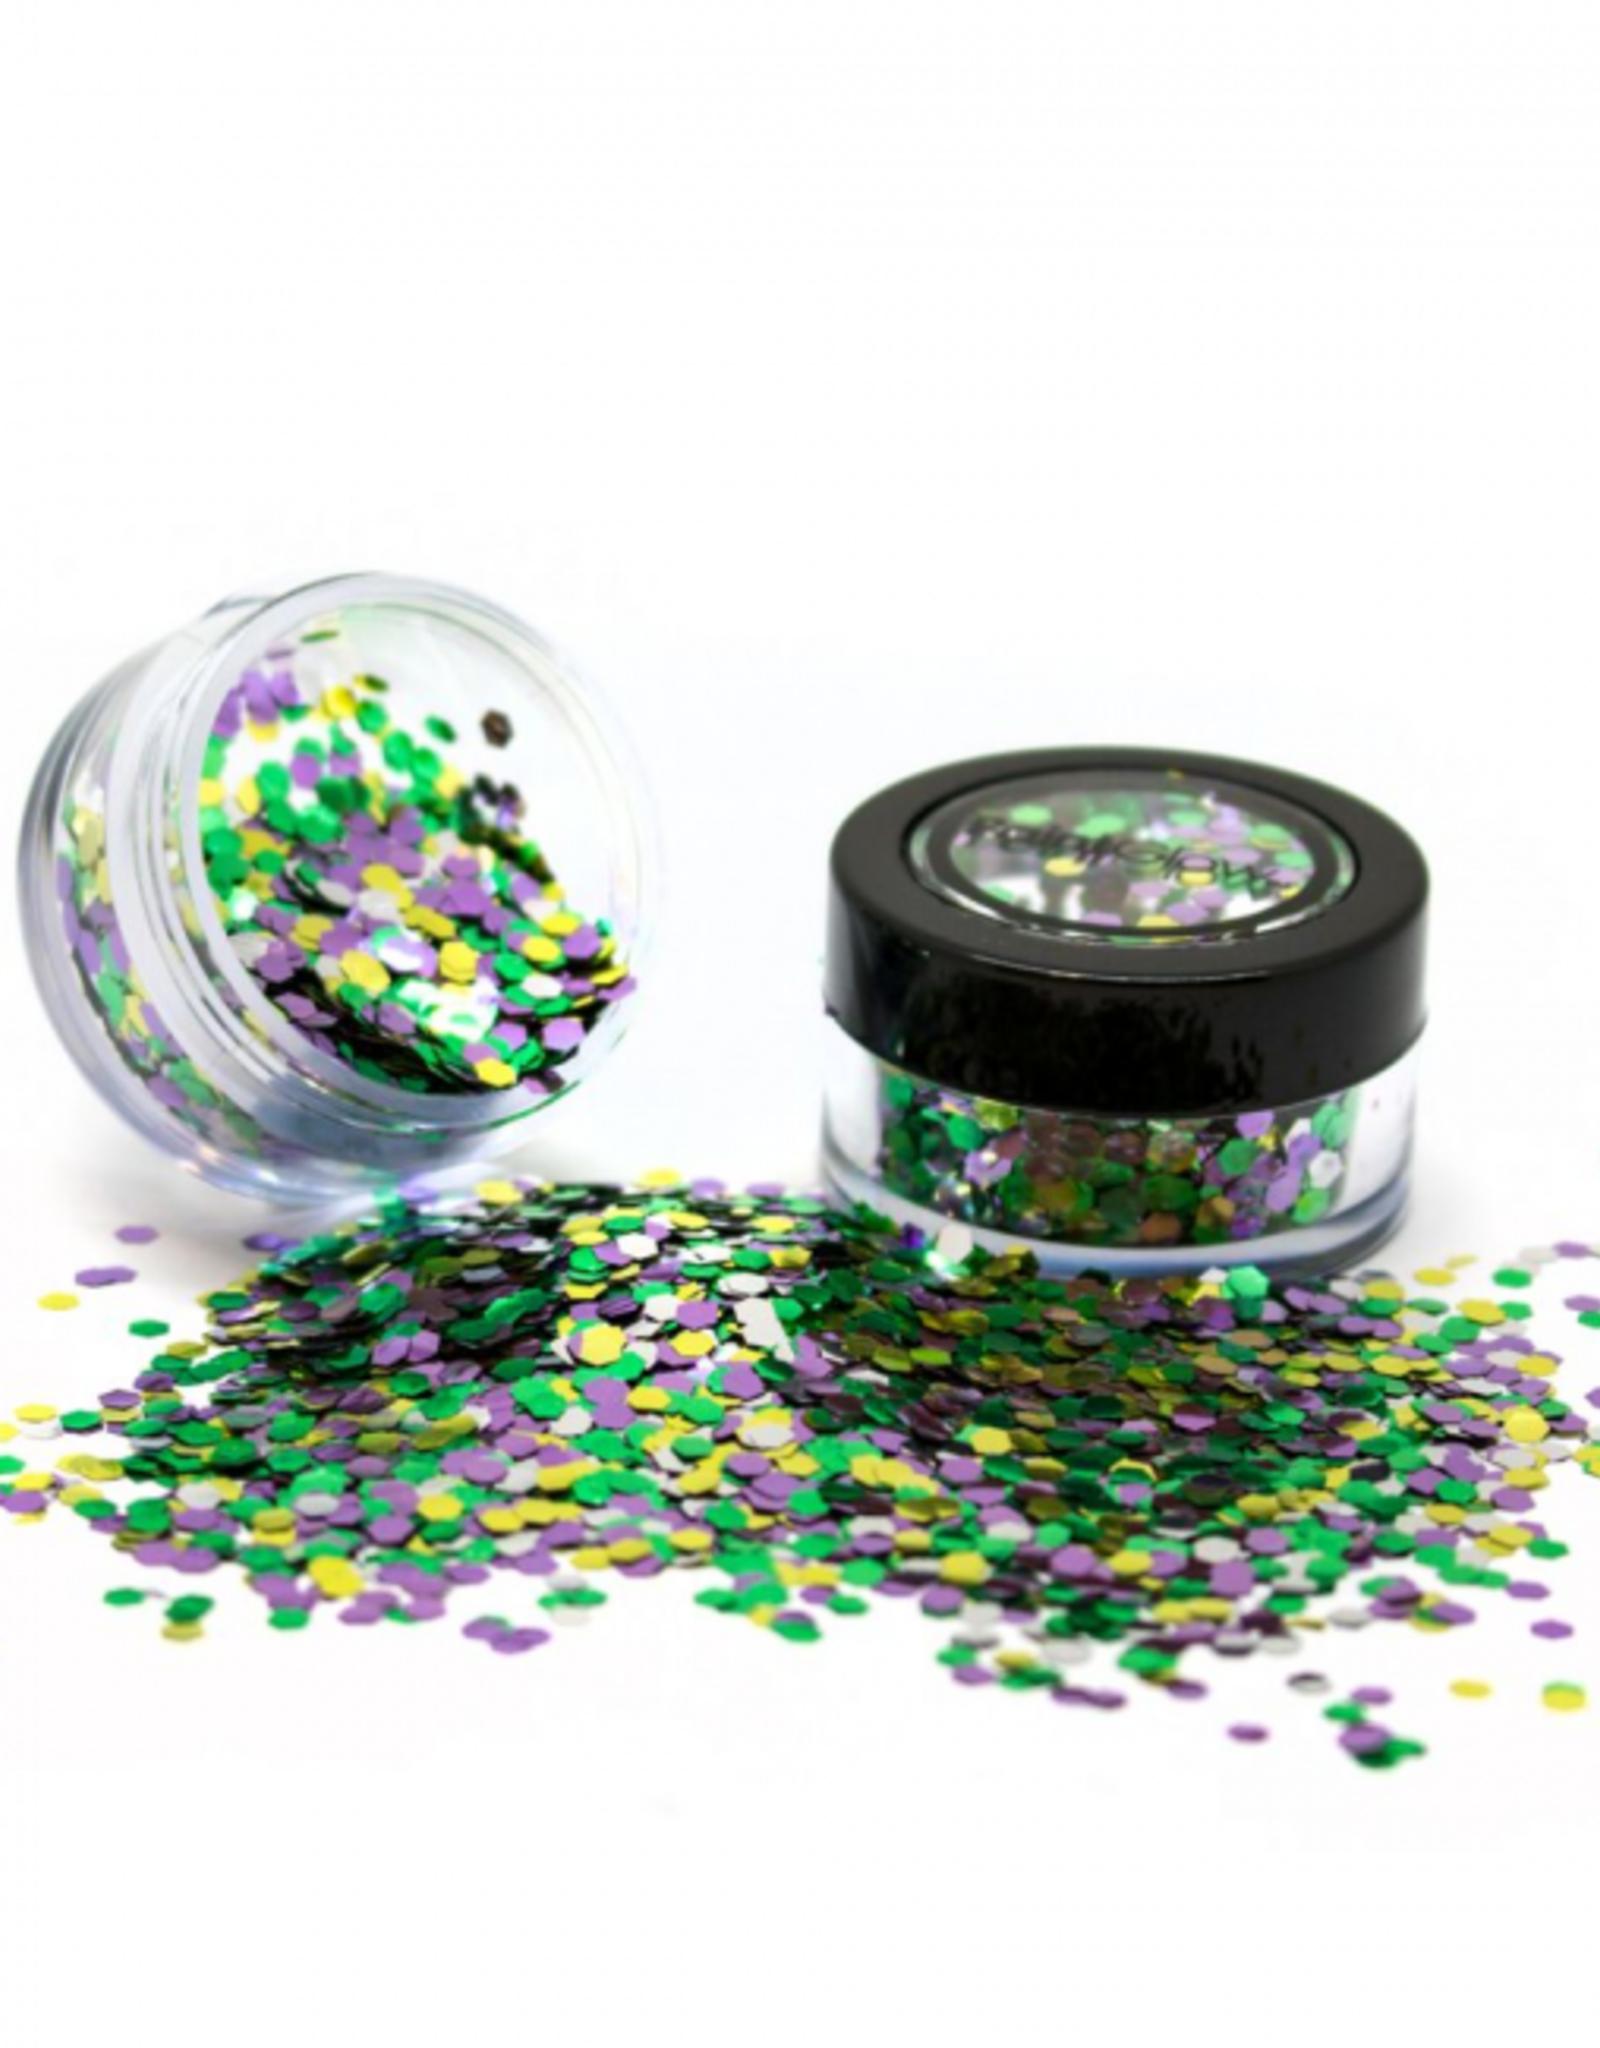 PartyXplosion Biologisch afbreekbare chunky glitters 3 gr. Rain Forest